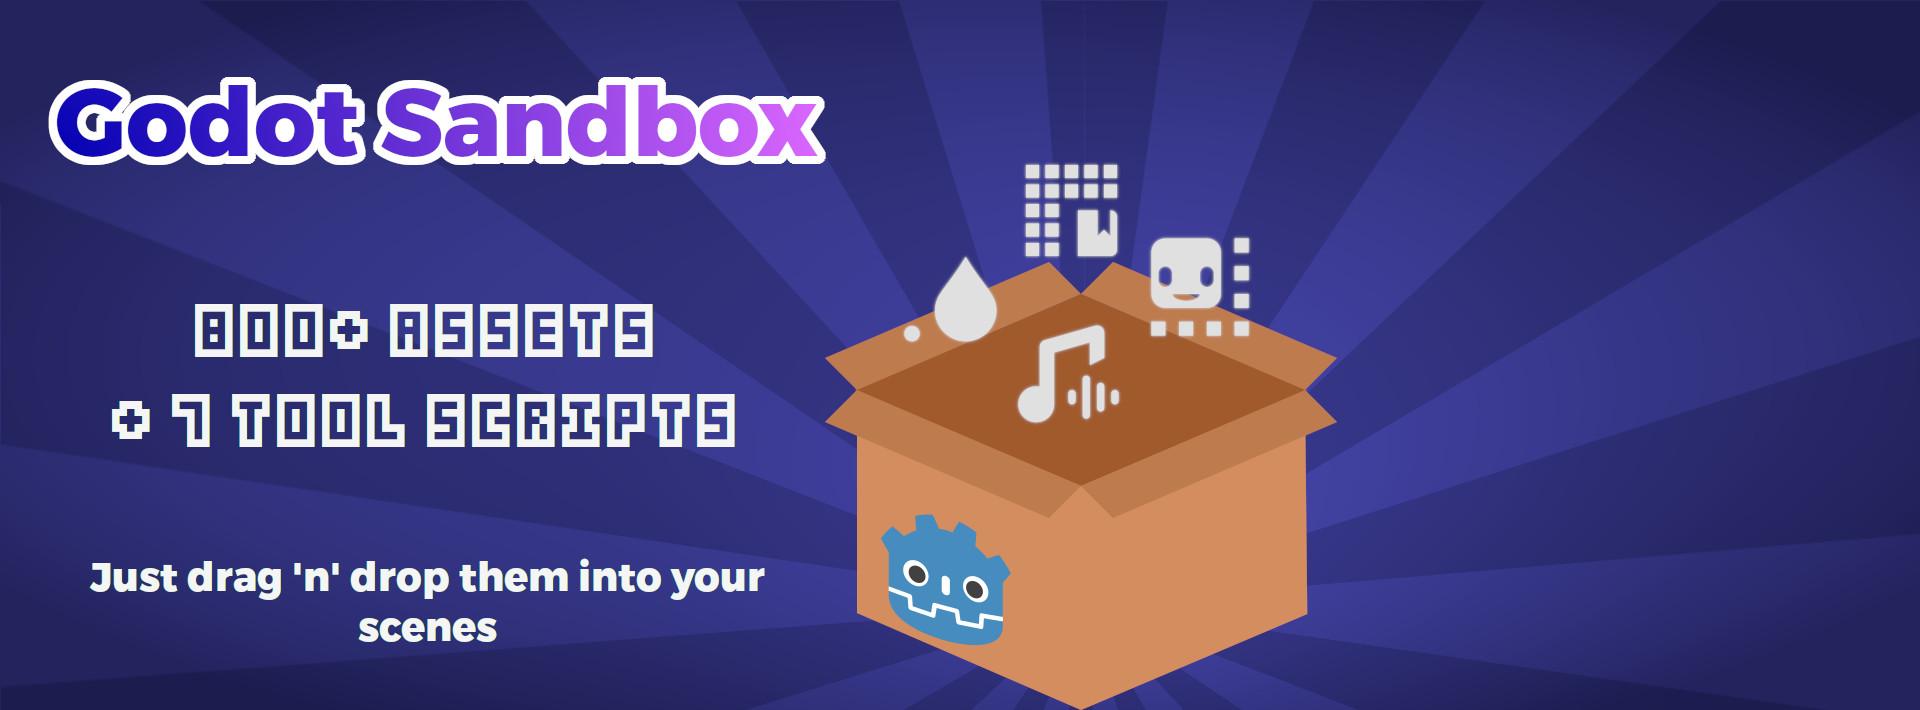 Godot Sandbox